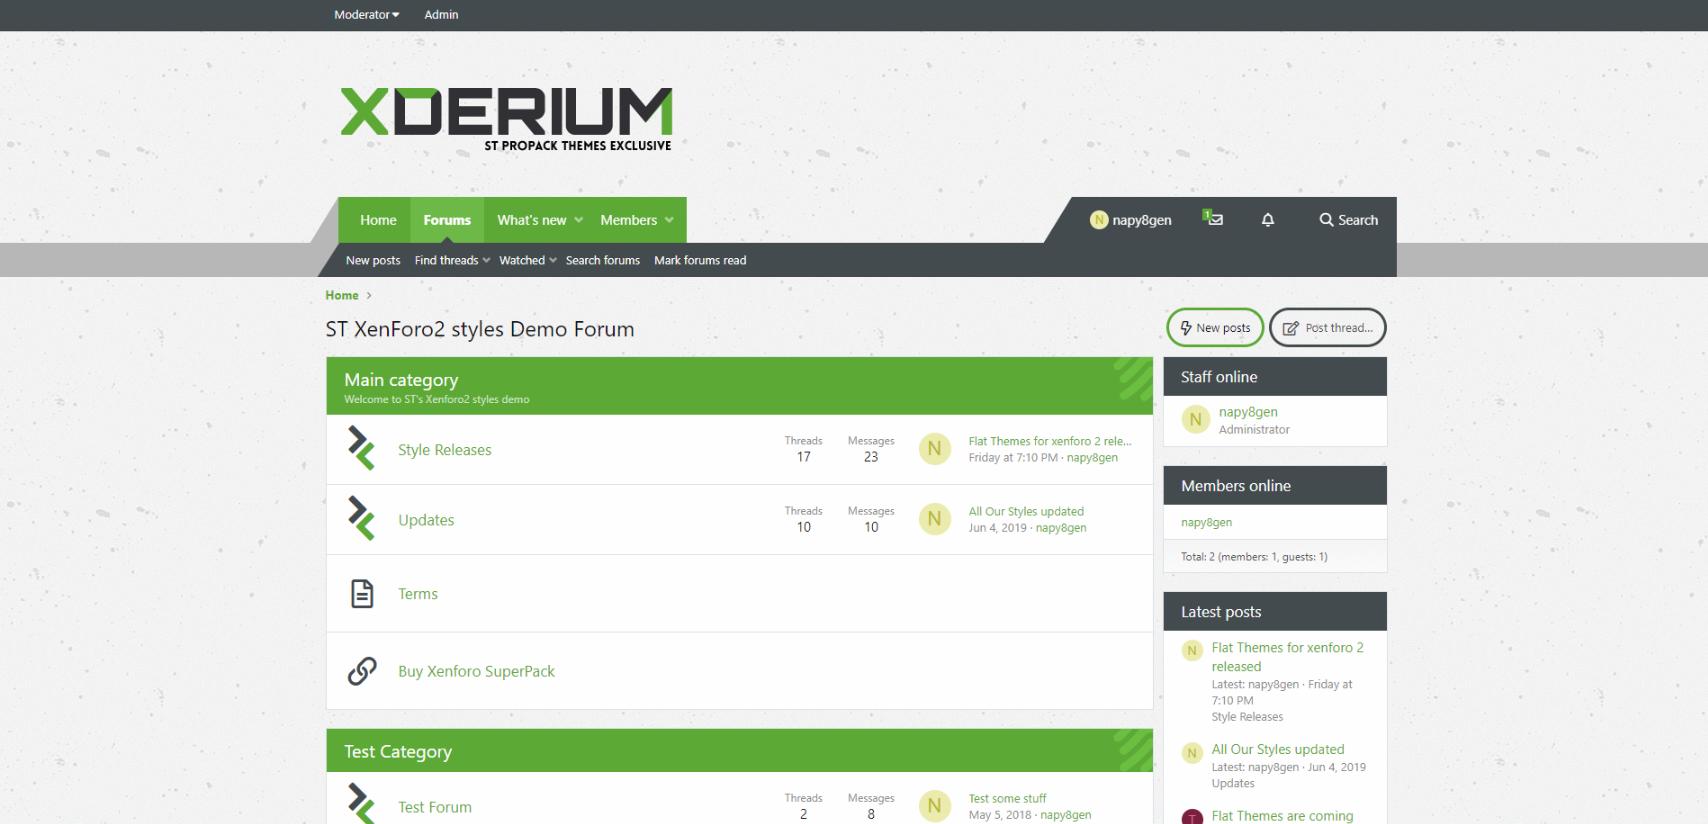 xderium apple - XDerium for xenforo2 released